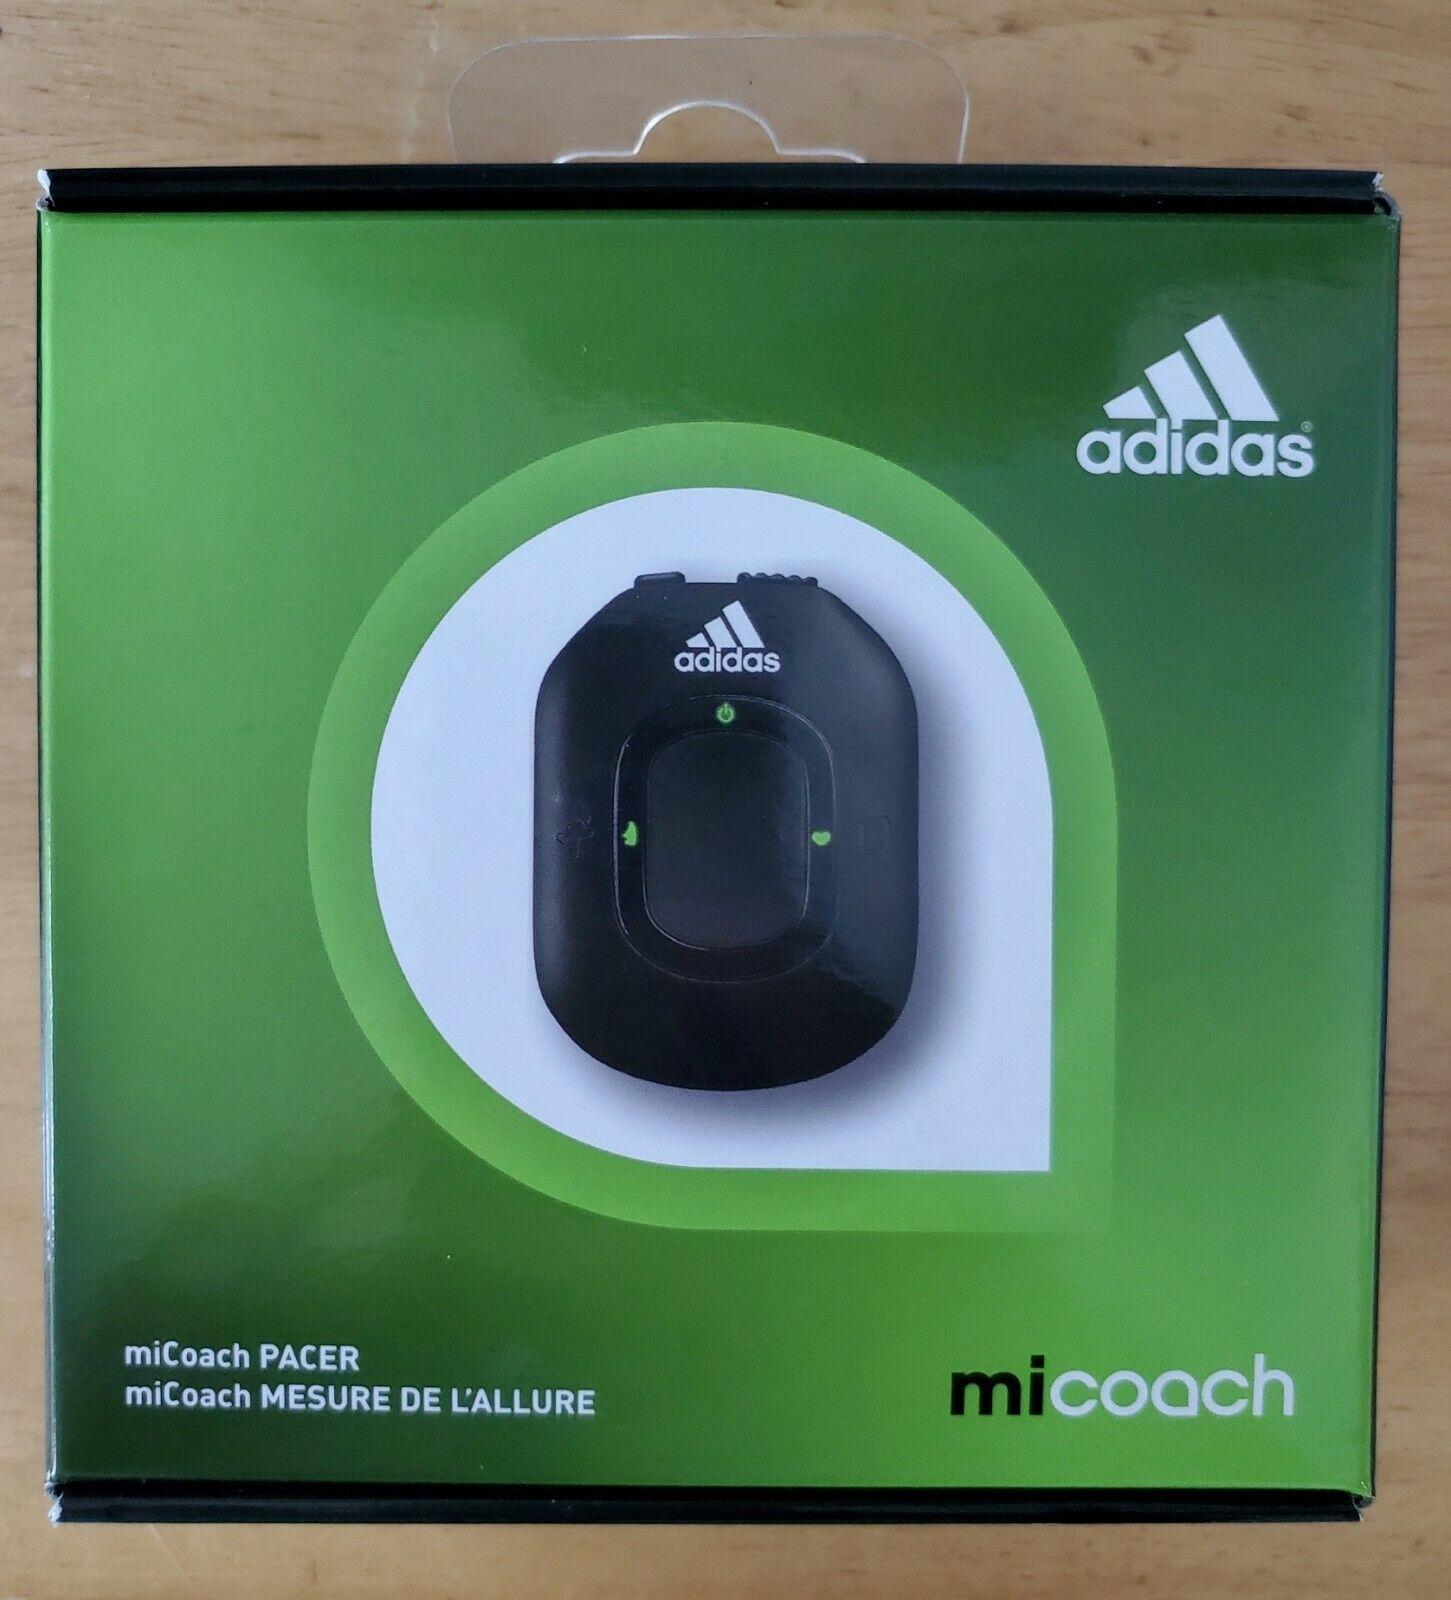 estafa Rectángulo Plasticidad  Adidas Micoach pacer transmisor medidor pulso monitor de ritmo cardiaco  Q00144 for sale online | eBay